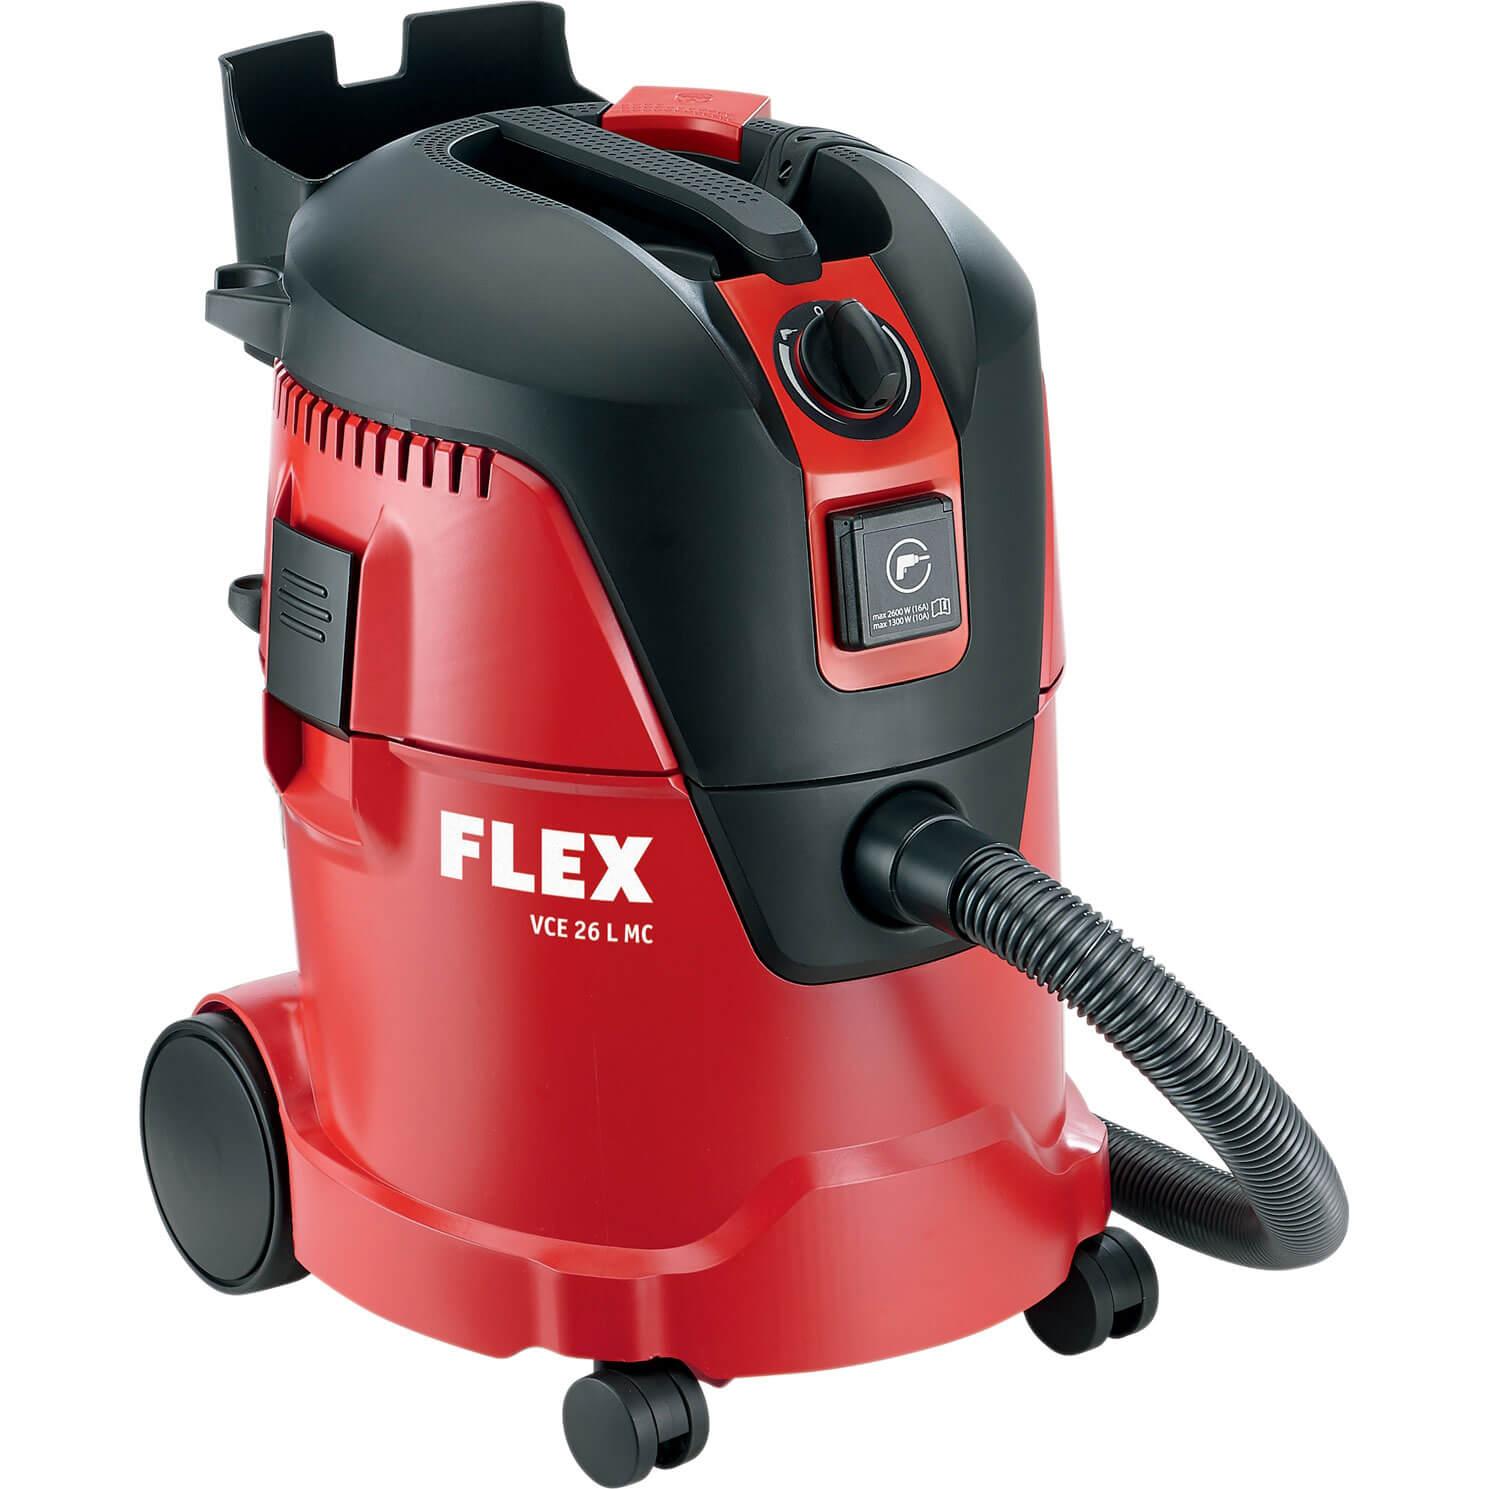 Flex VCE 26 L MC Industrial Wet & Dry Dust Extractor 110v